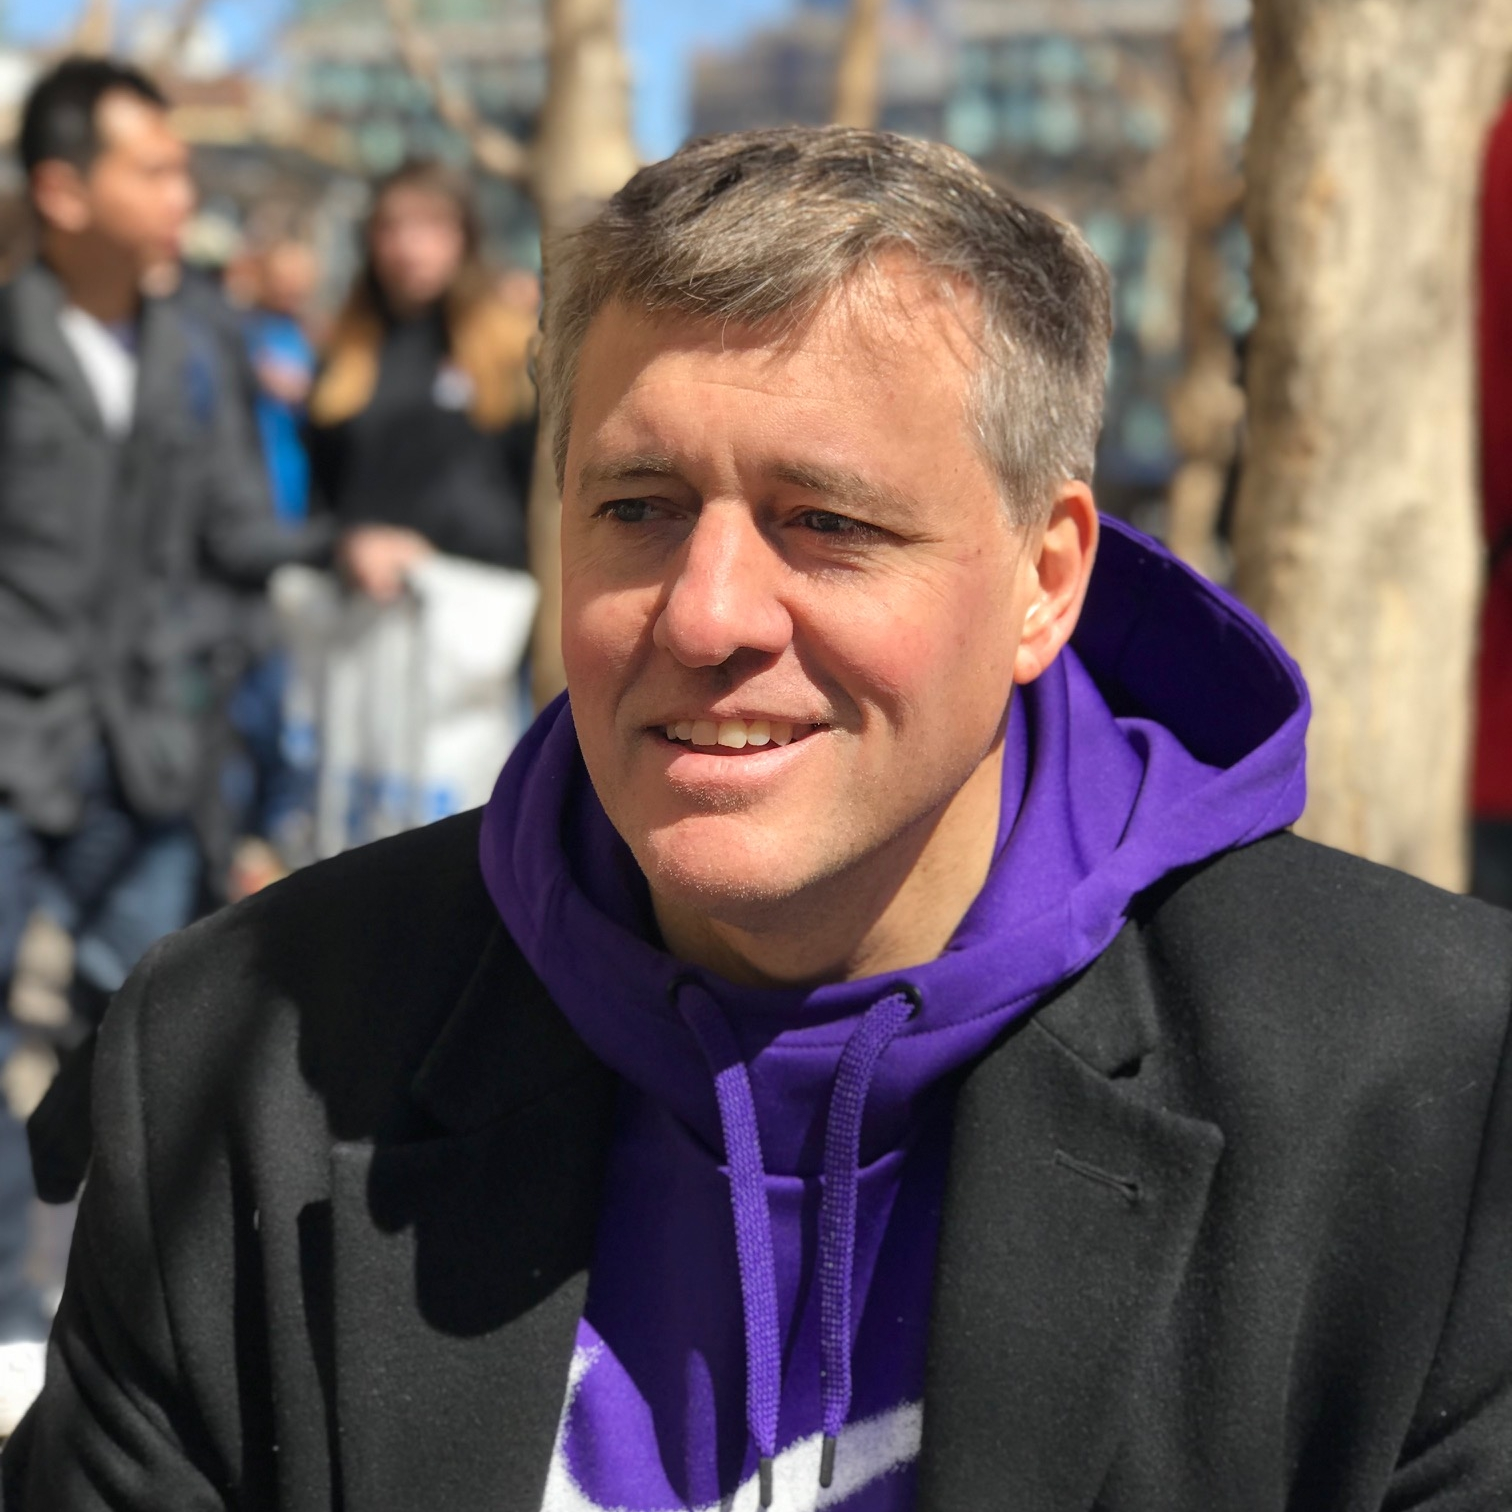 ERIK VANDER KOLK - Board Member